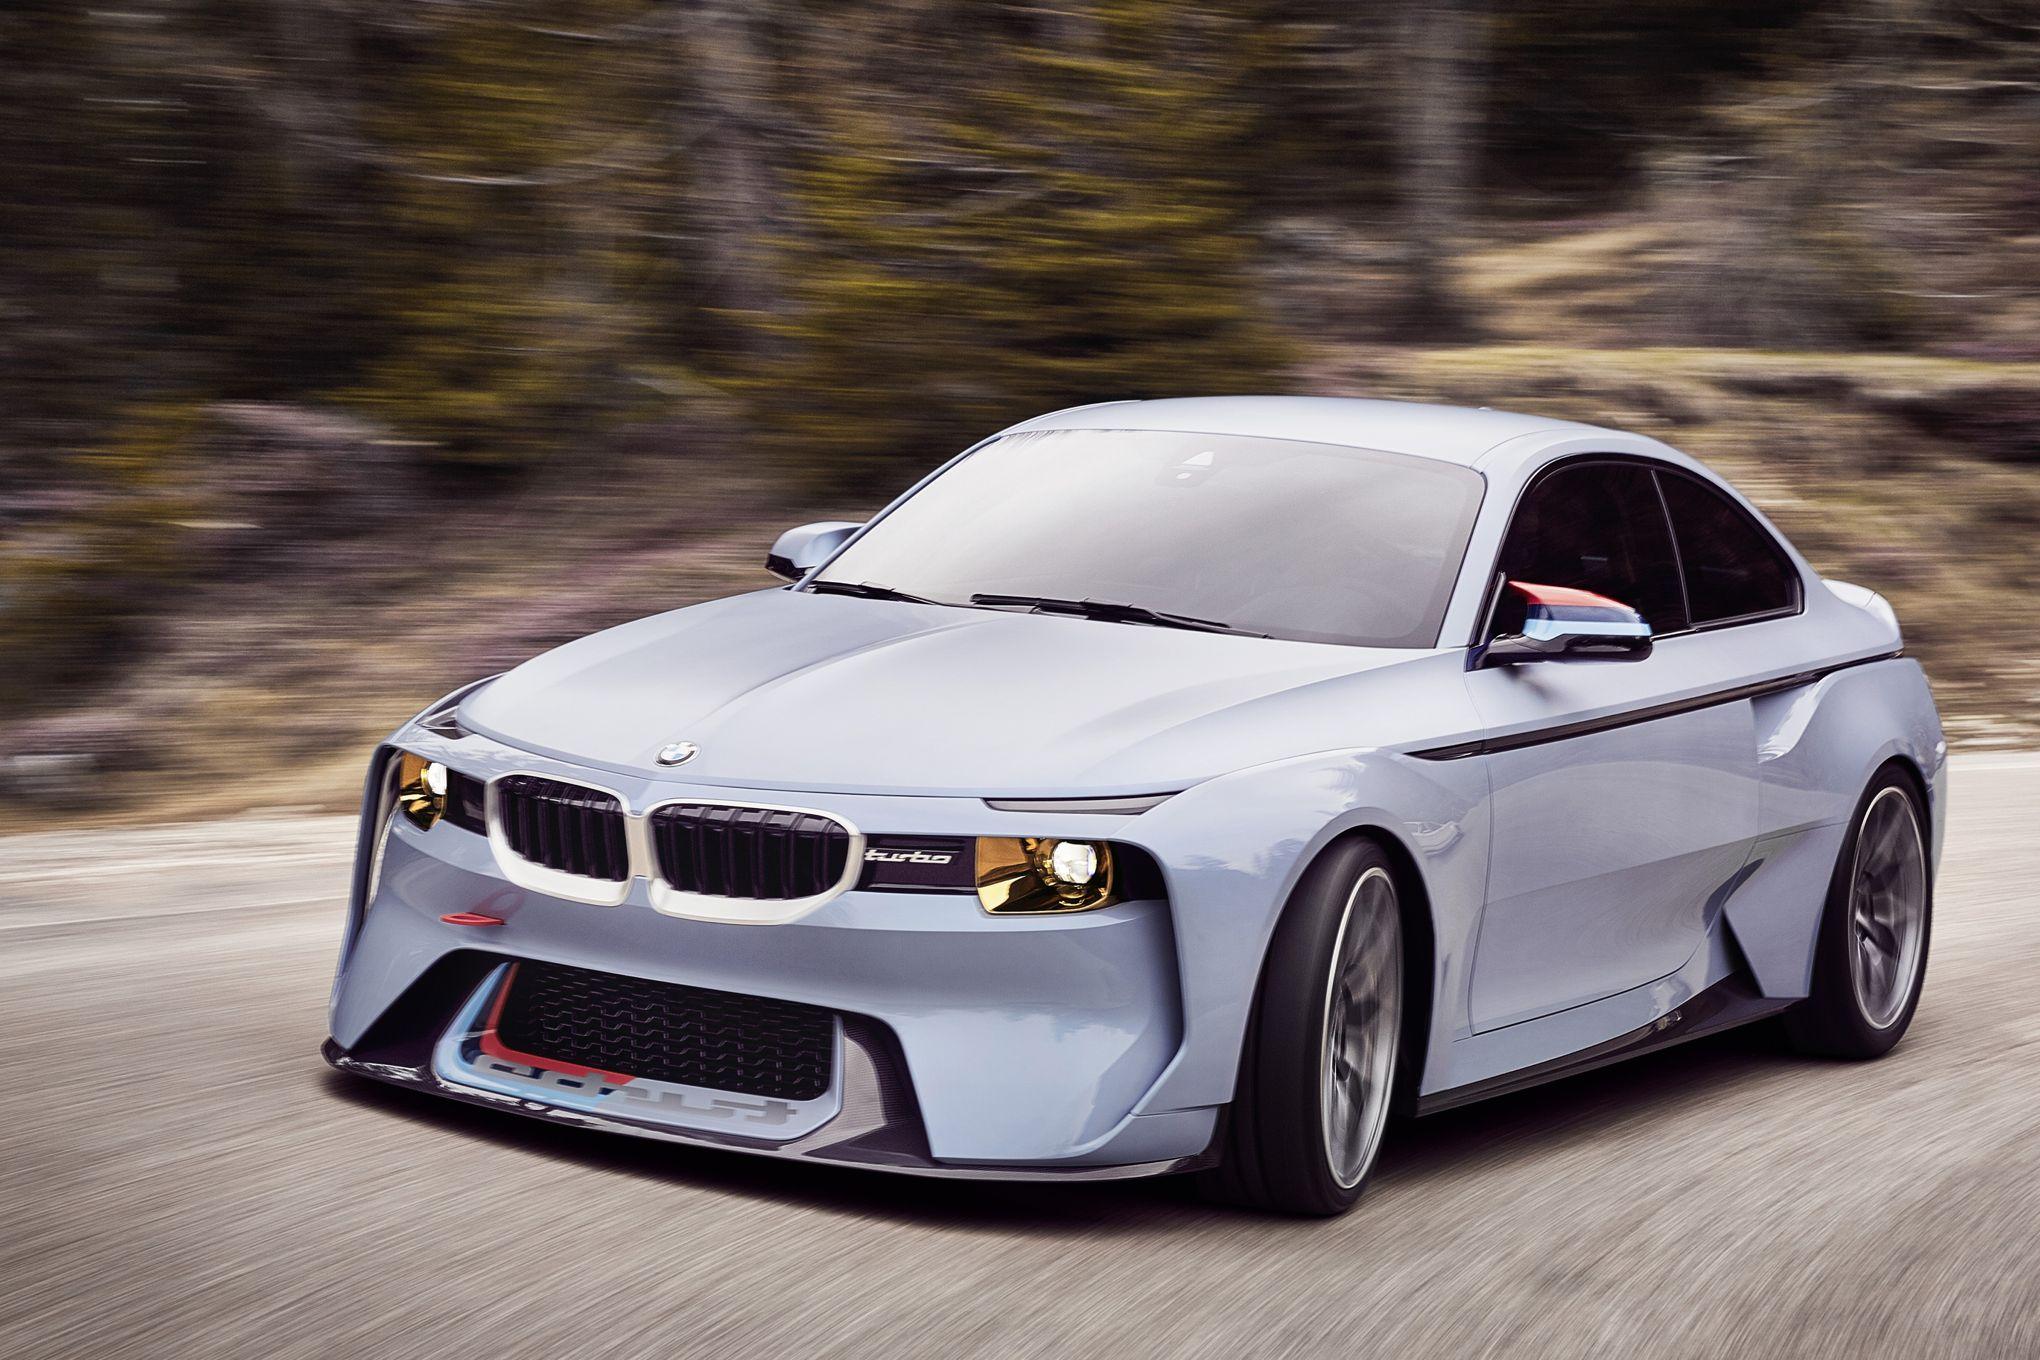 2019 - [BMW] Concept 4 - Page 4 XVM11006b4e-20eb-11e6-9053-e86a353c239c-300x200